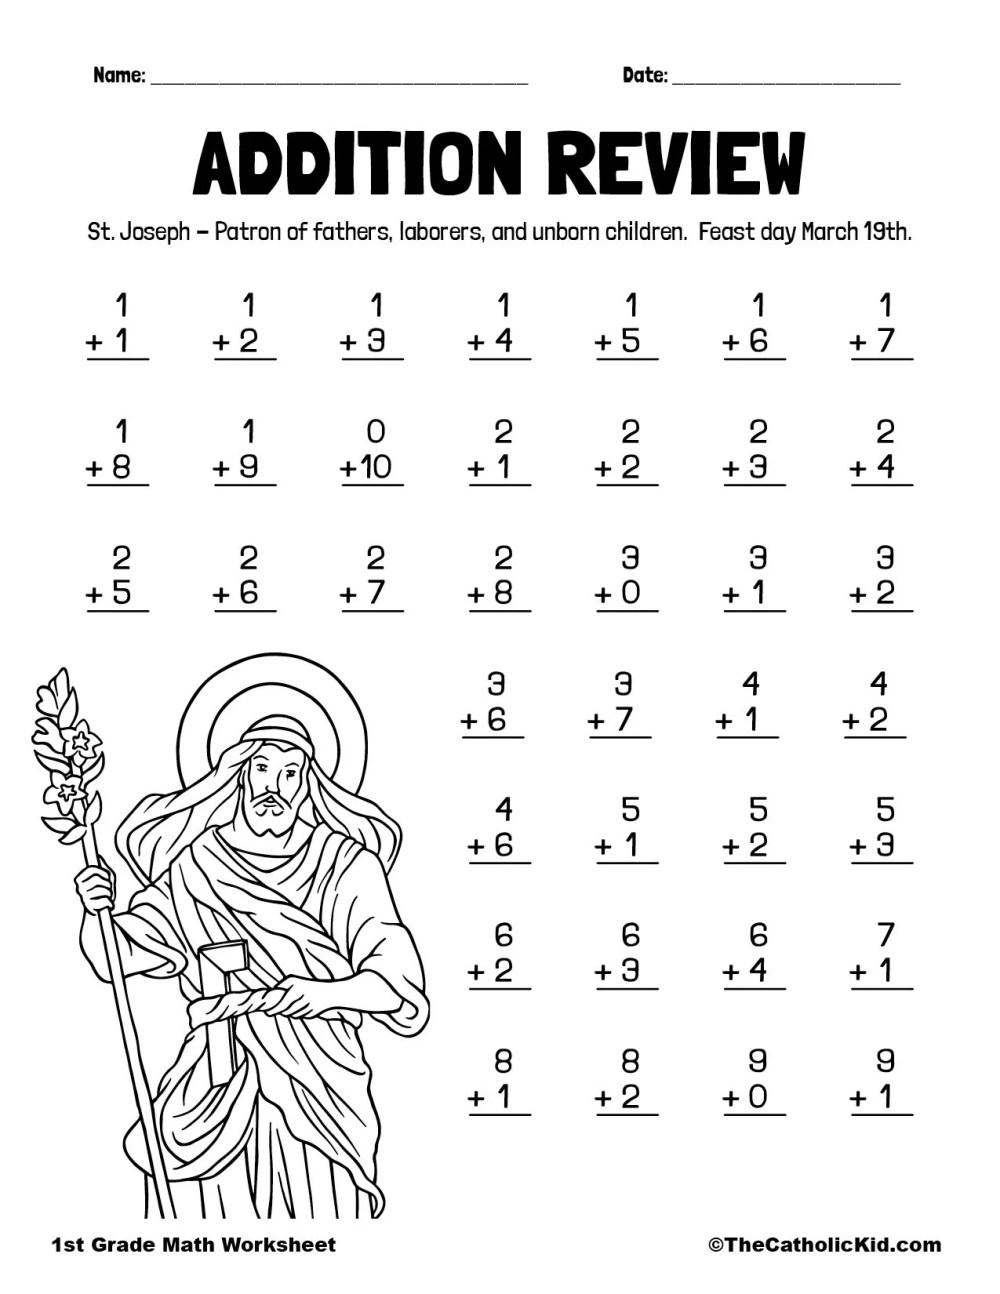 medium resolution of Addition Practice - 1st Grade Math Worksheet Catholic - TheCatholicKid.com